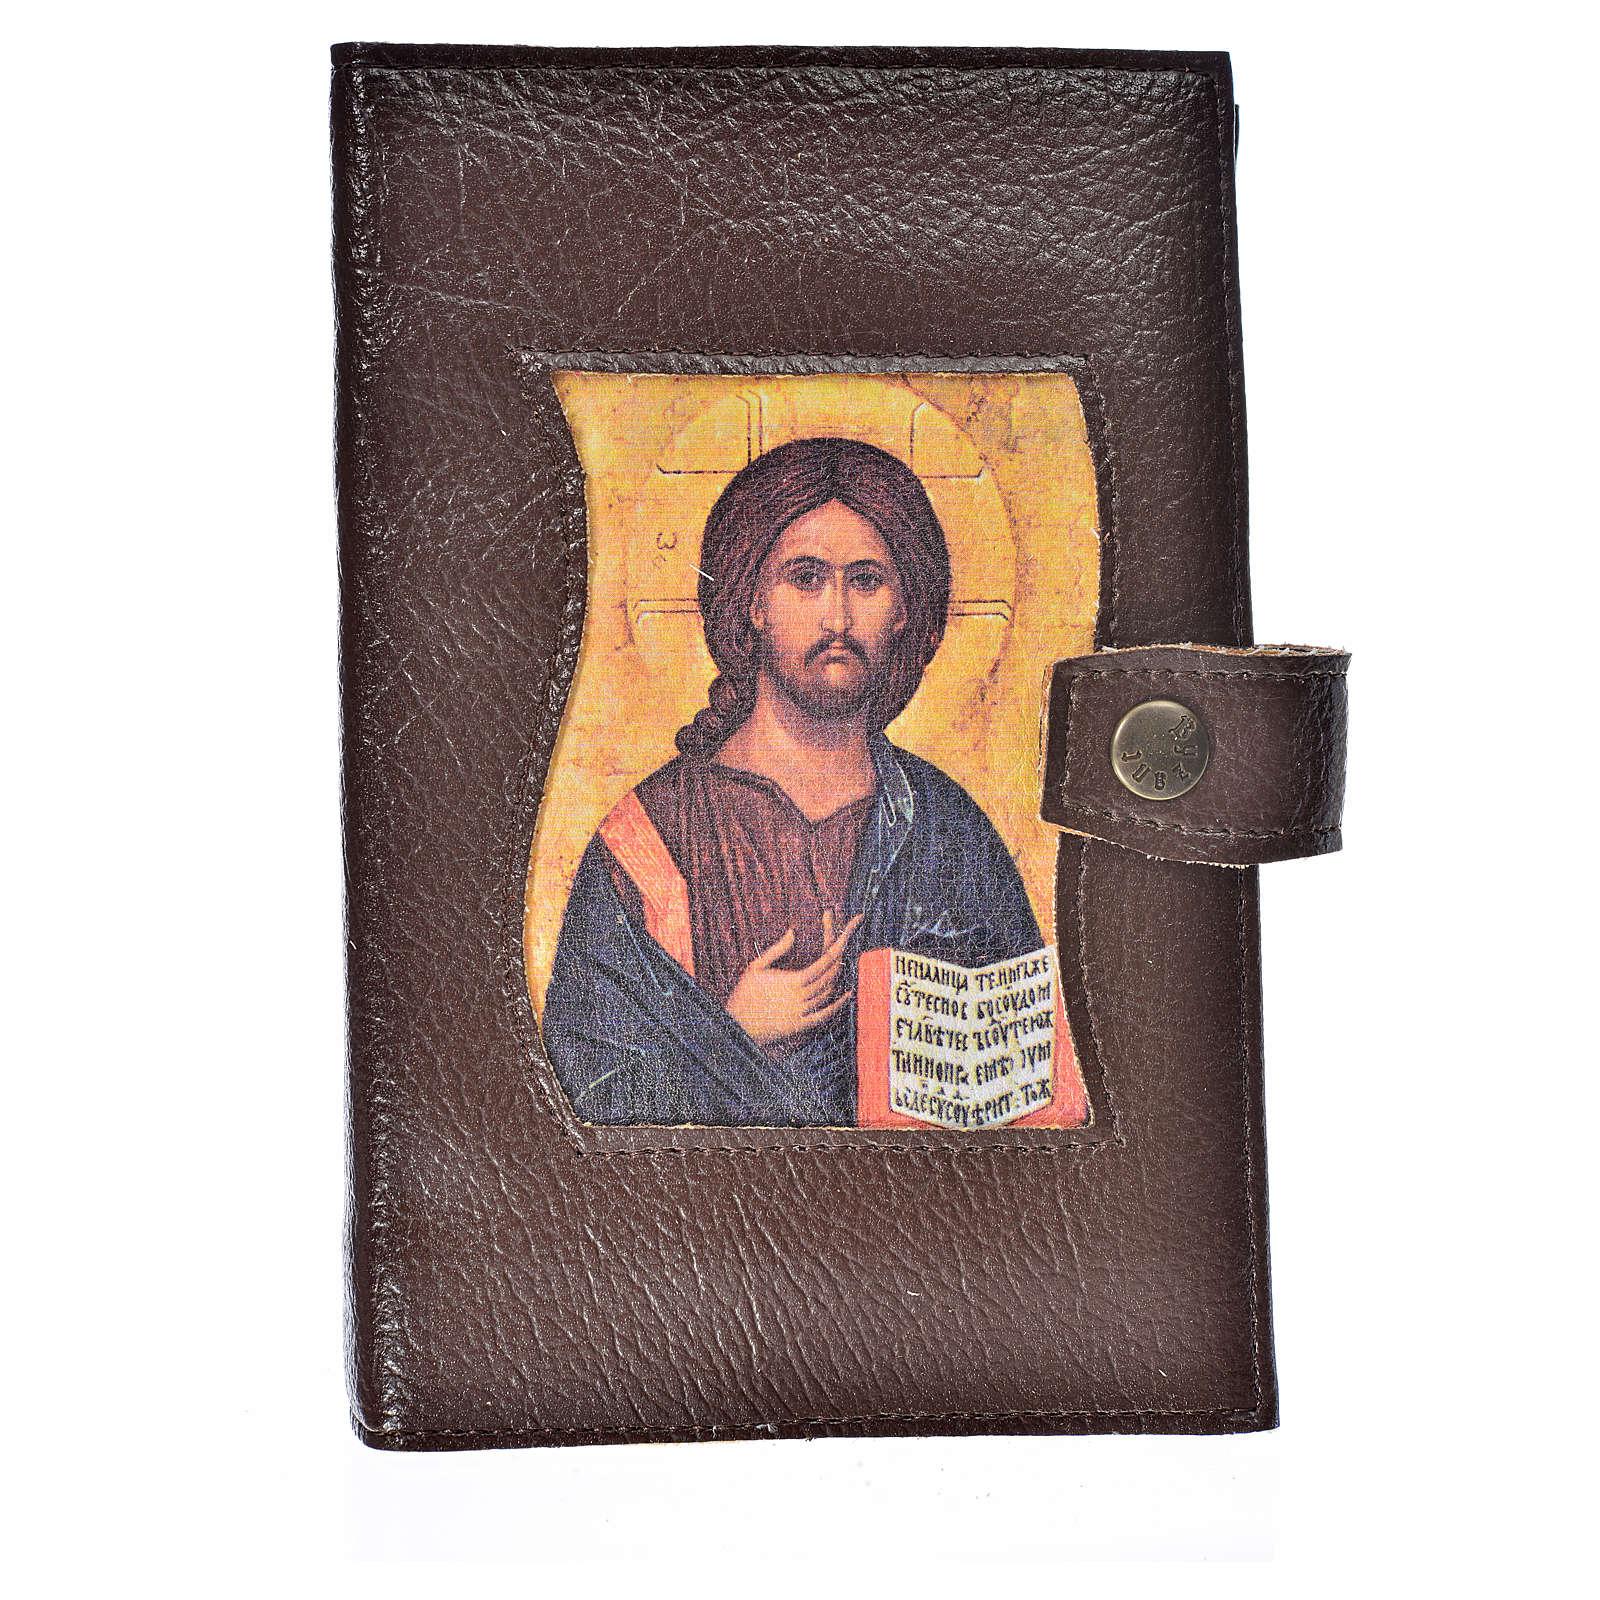 Funda Sagrada Biblia CEE ED. Pop. Jesús simil cuero marrón 4